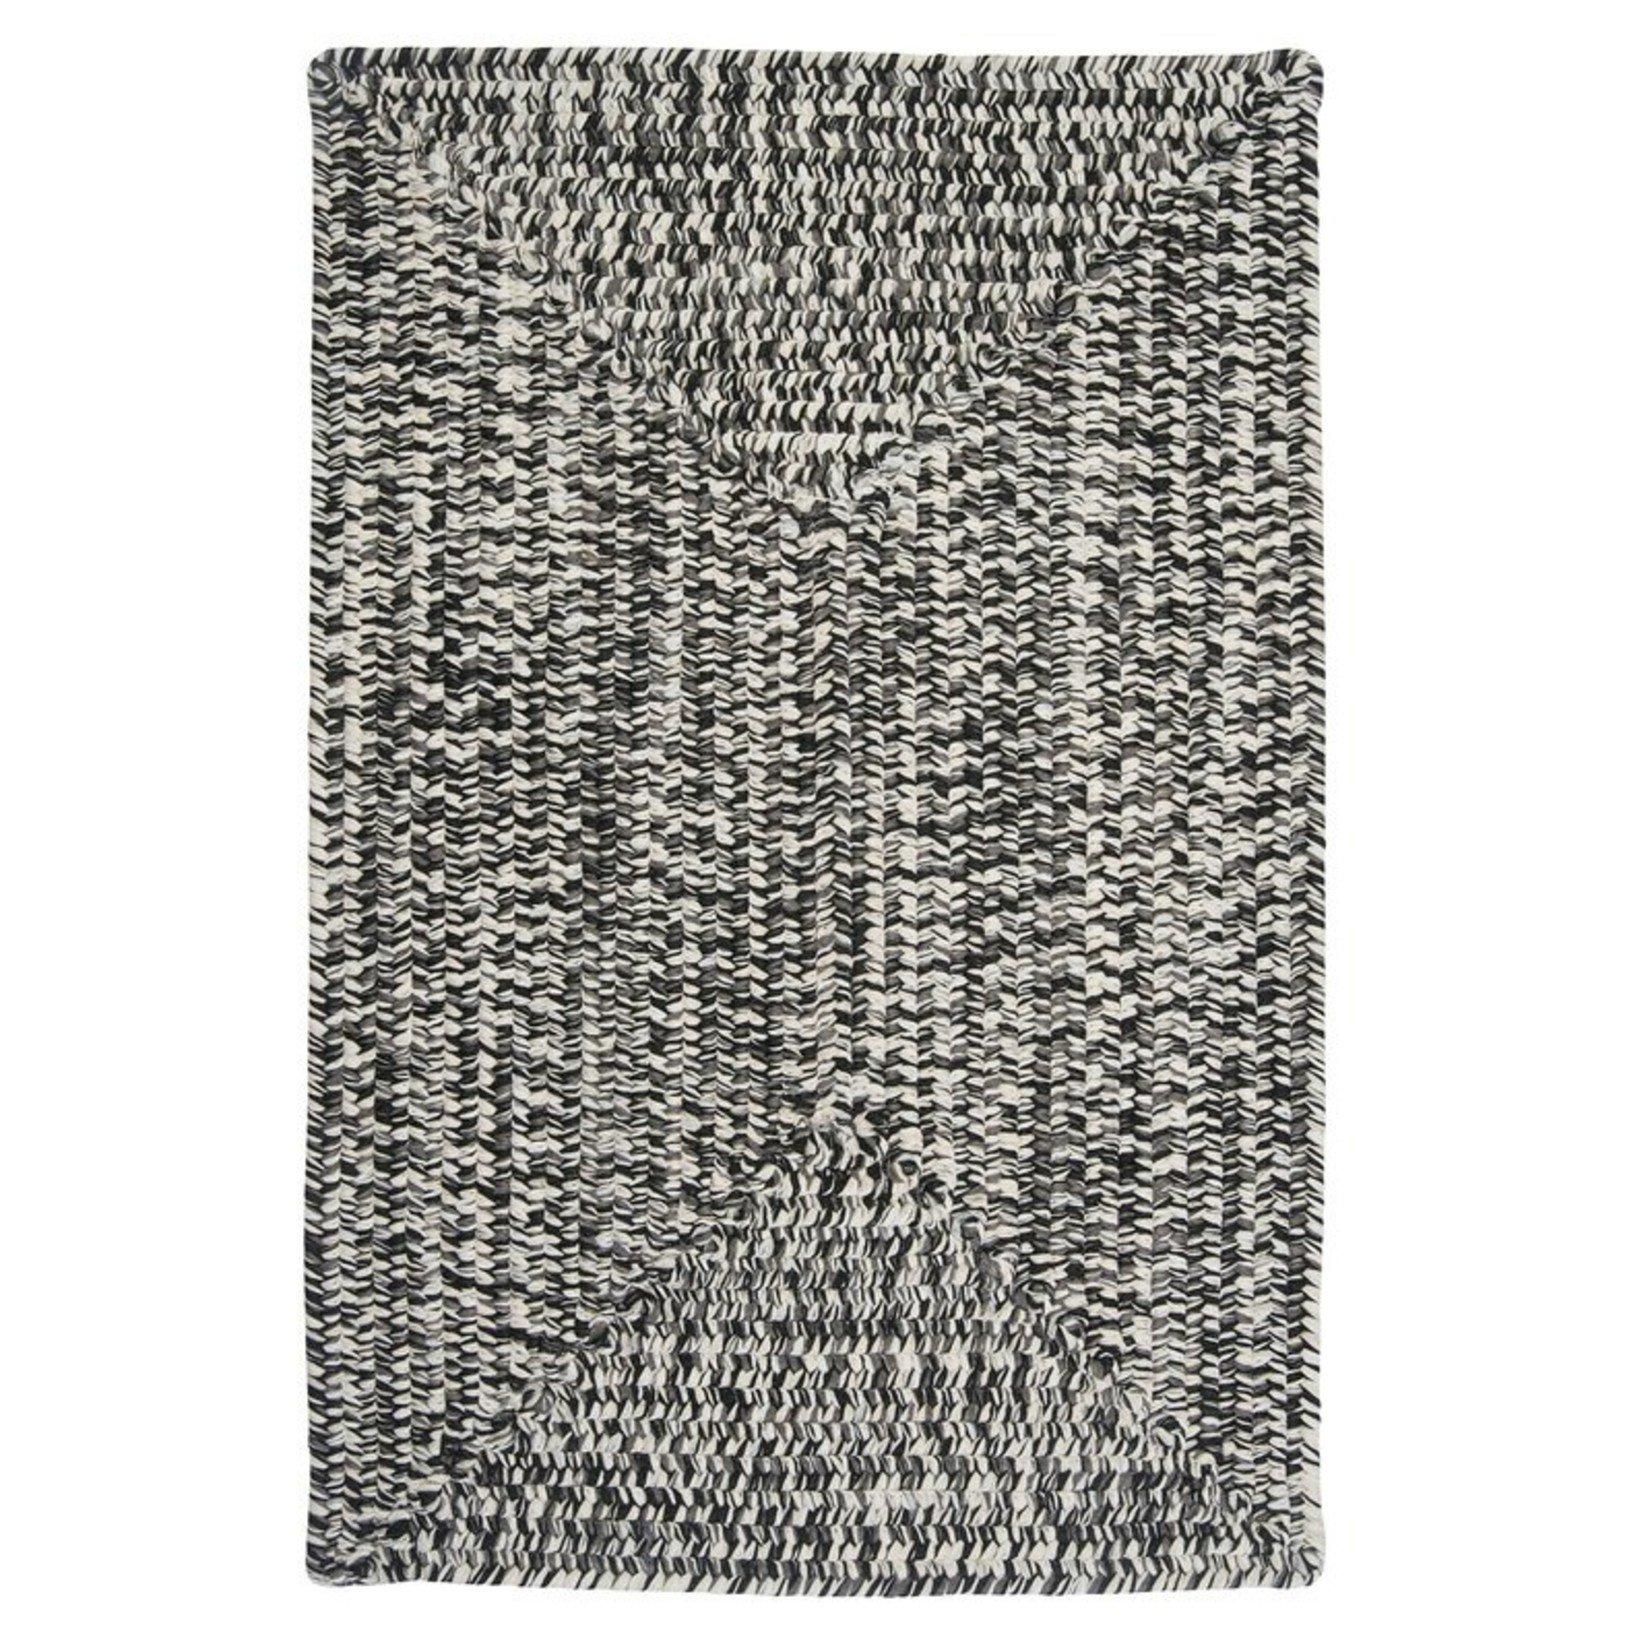 *3' x 5' - Hawkins Chevron Braided Black/White Area Rug